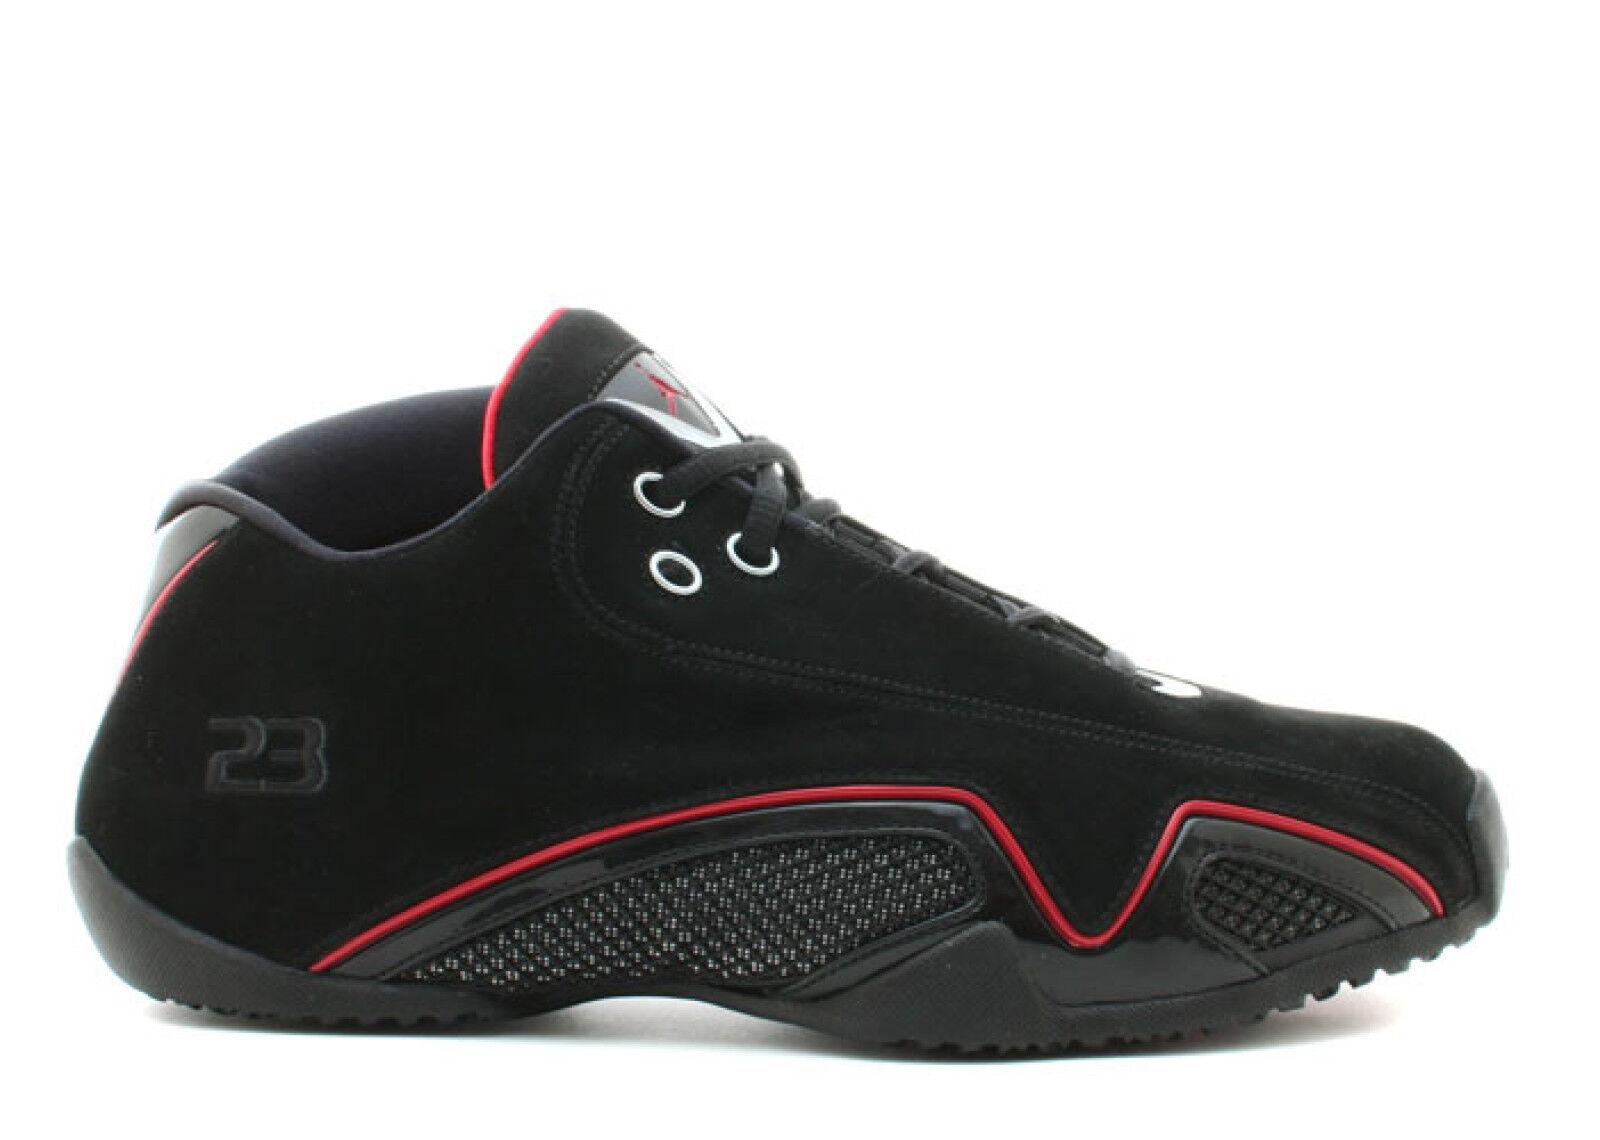 2018 Nike Air Jordan 21 XX1 Low Bred Suede Size 11.5. 313529-002 1 2 3 4 5 6